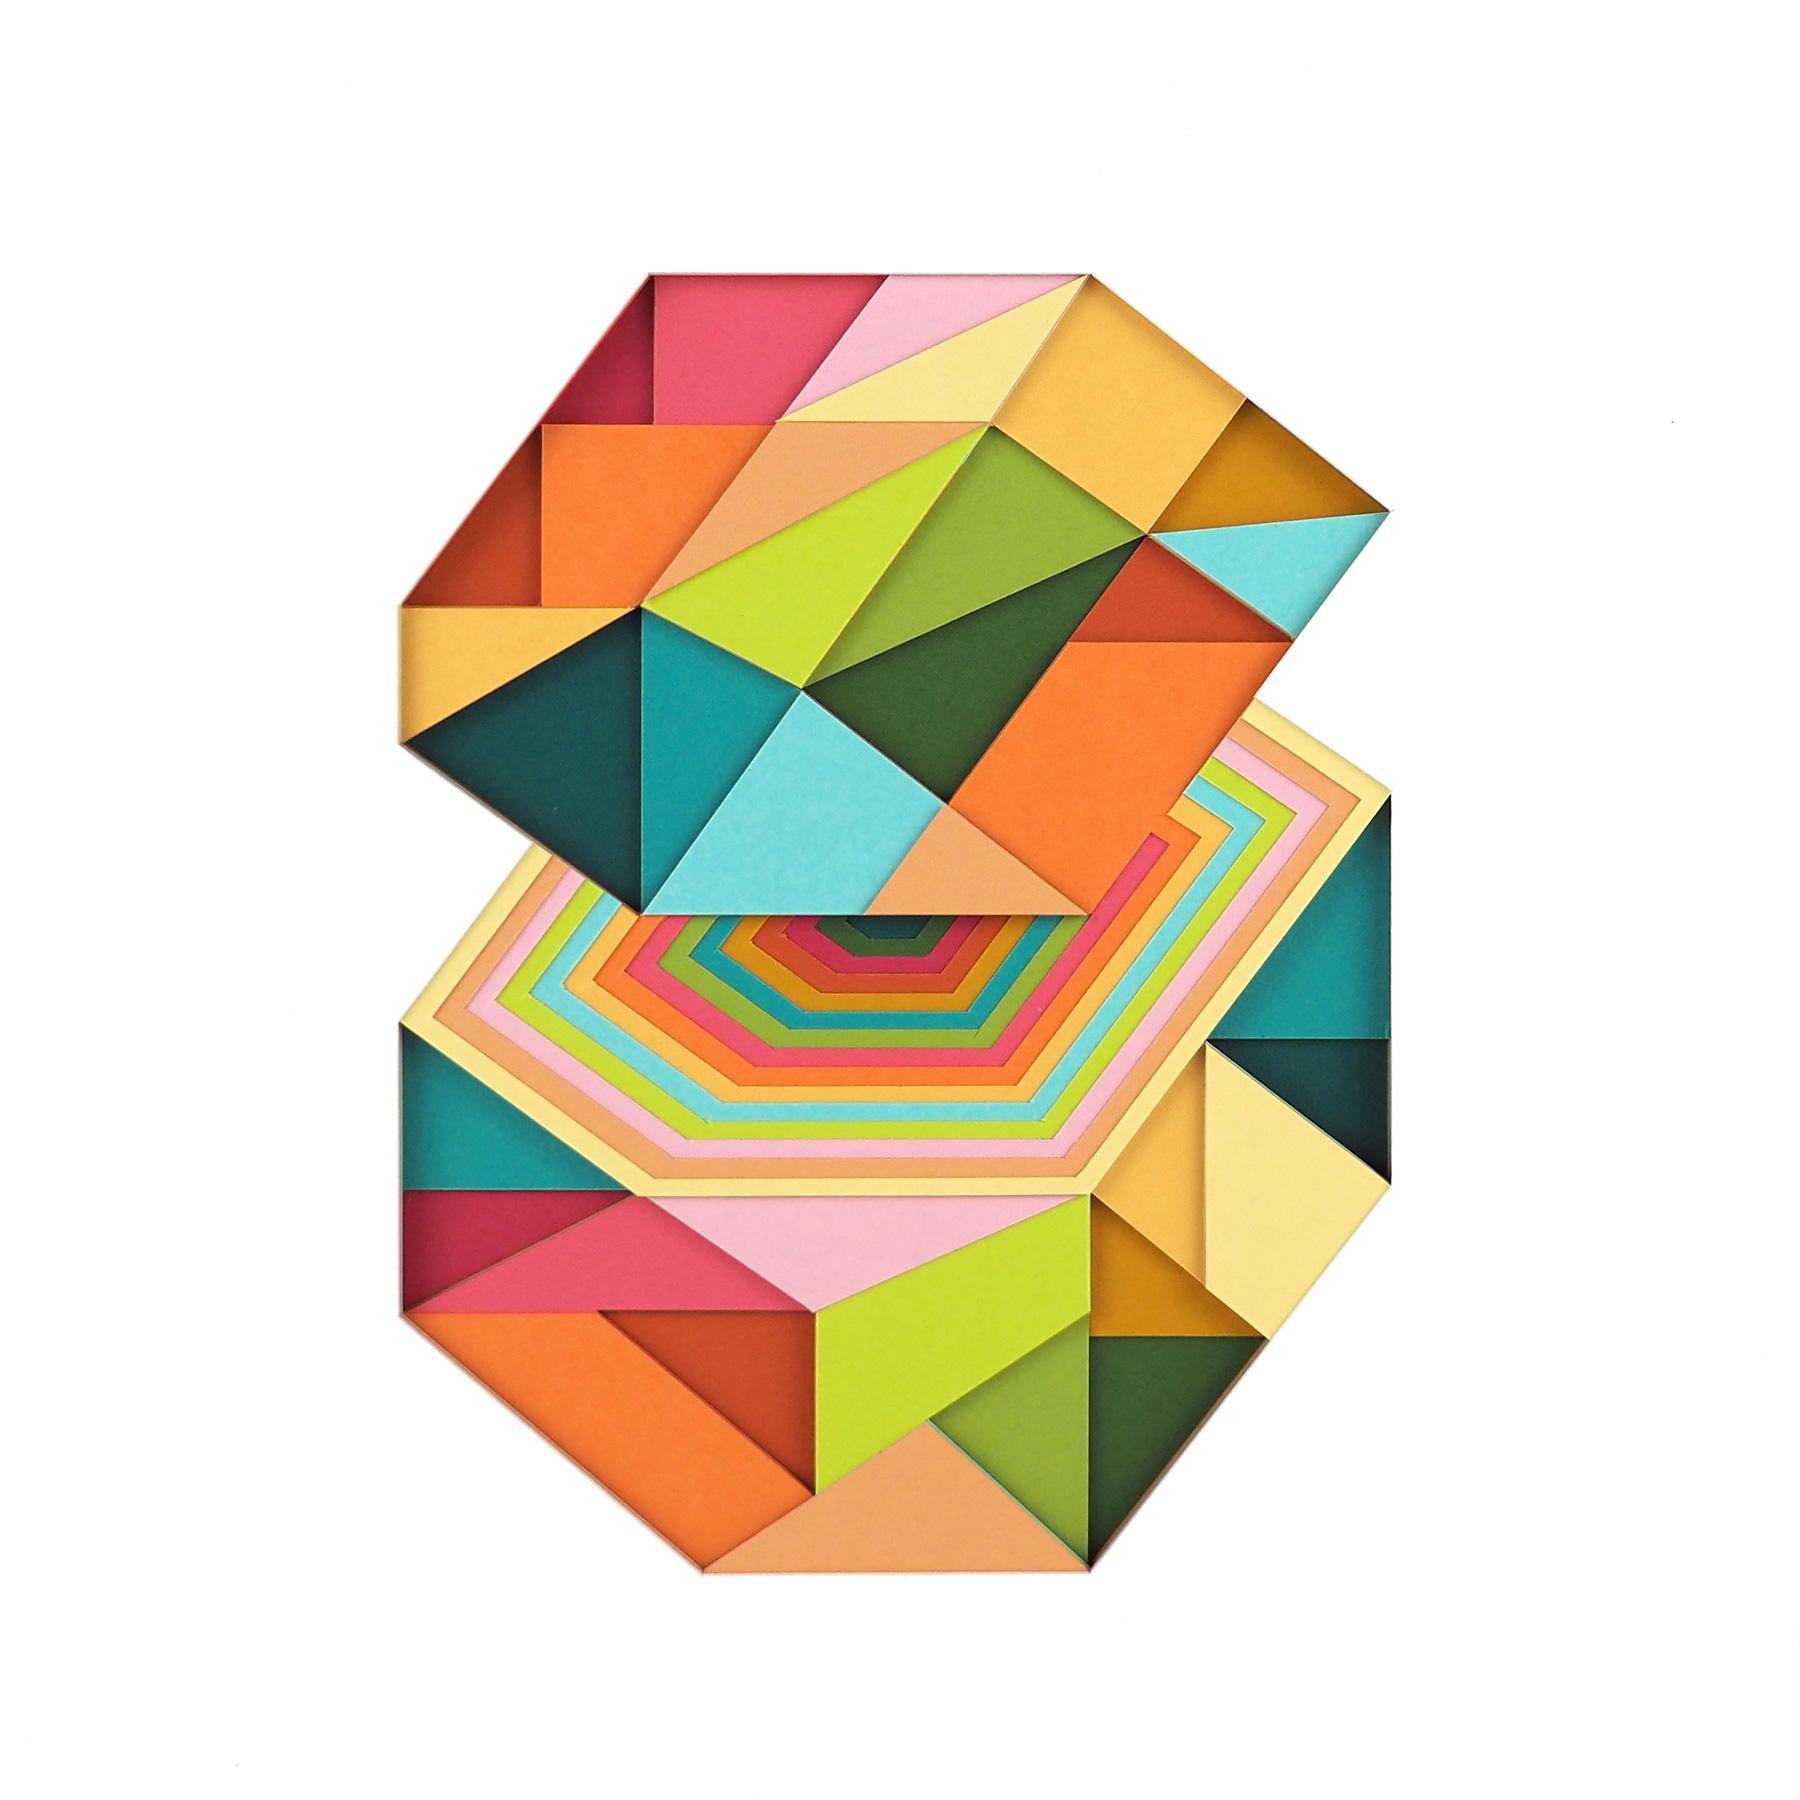 "Huntz Liu untitled 1, 2021 Layered hand-cut paper on wood panel 10"" x 10"""